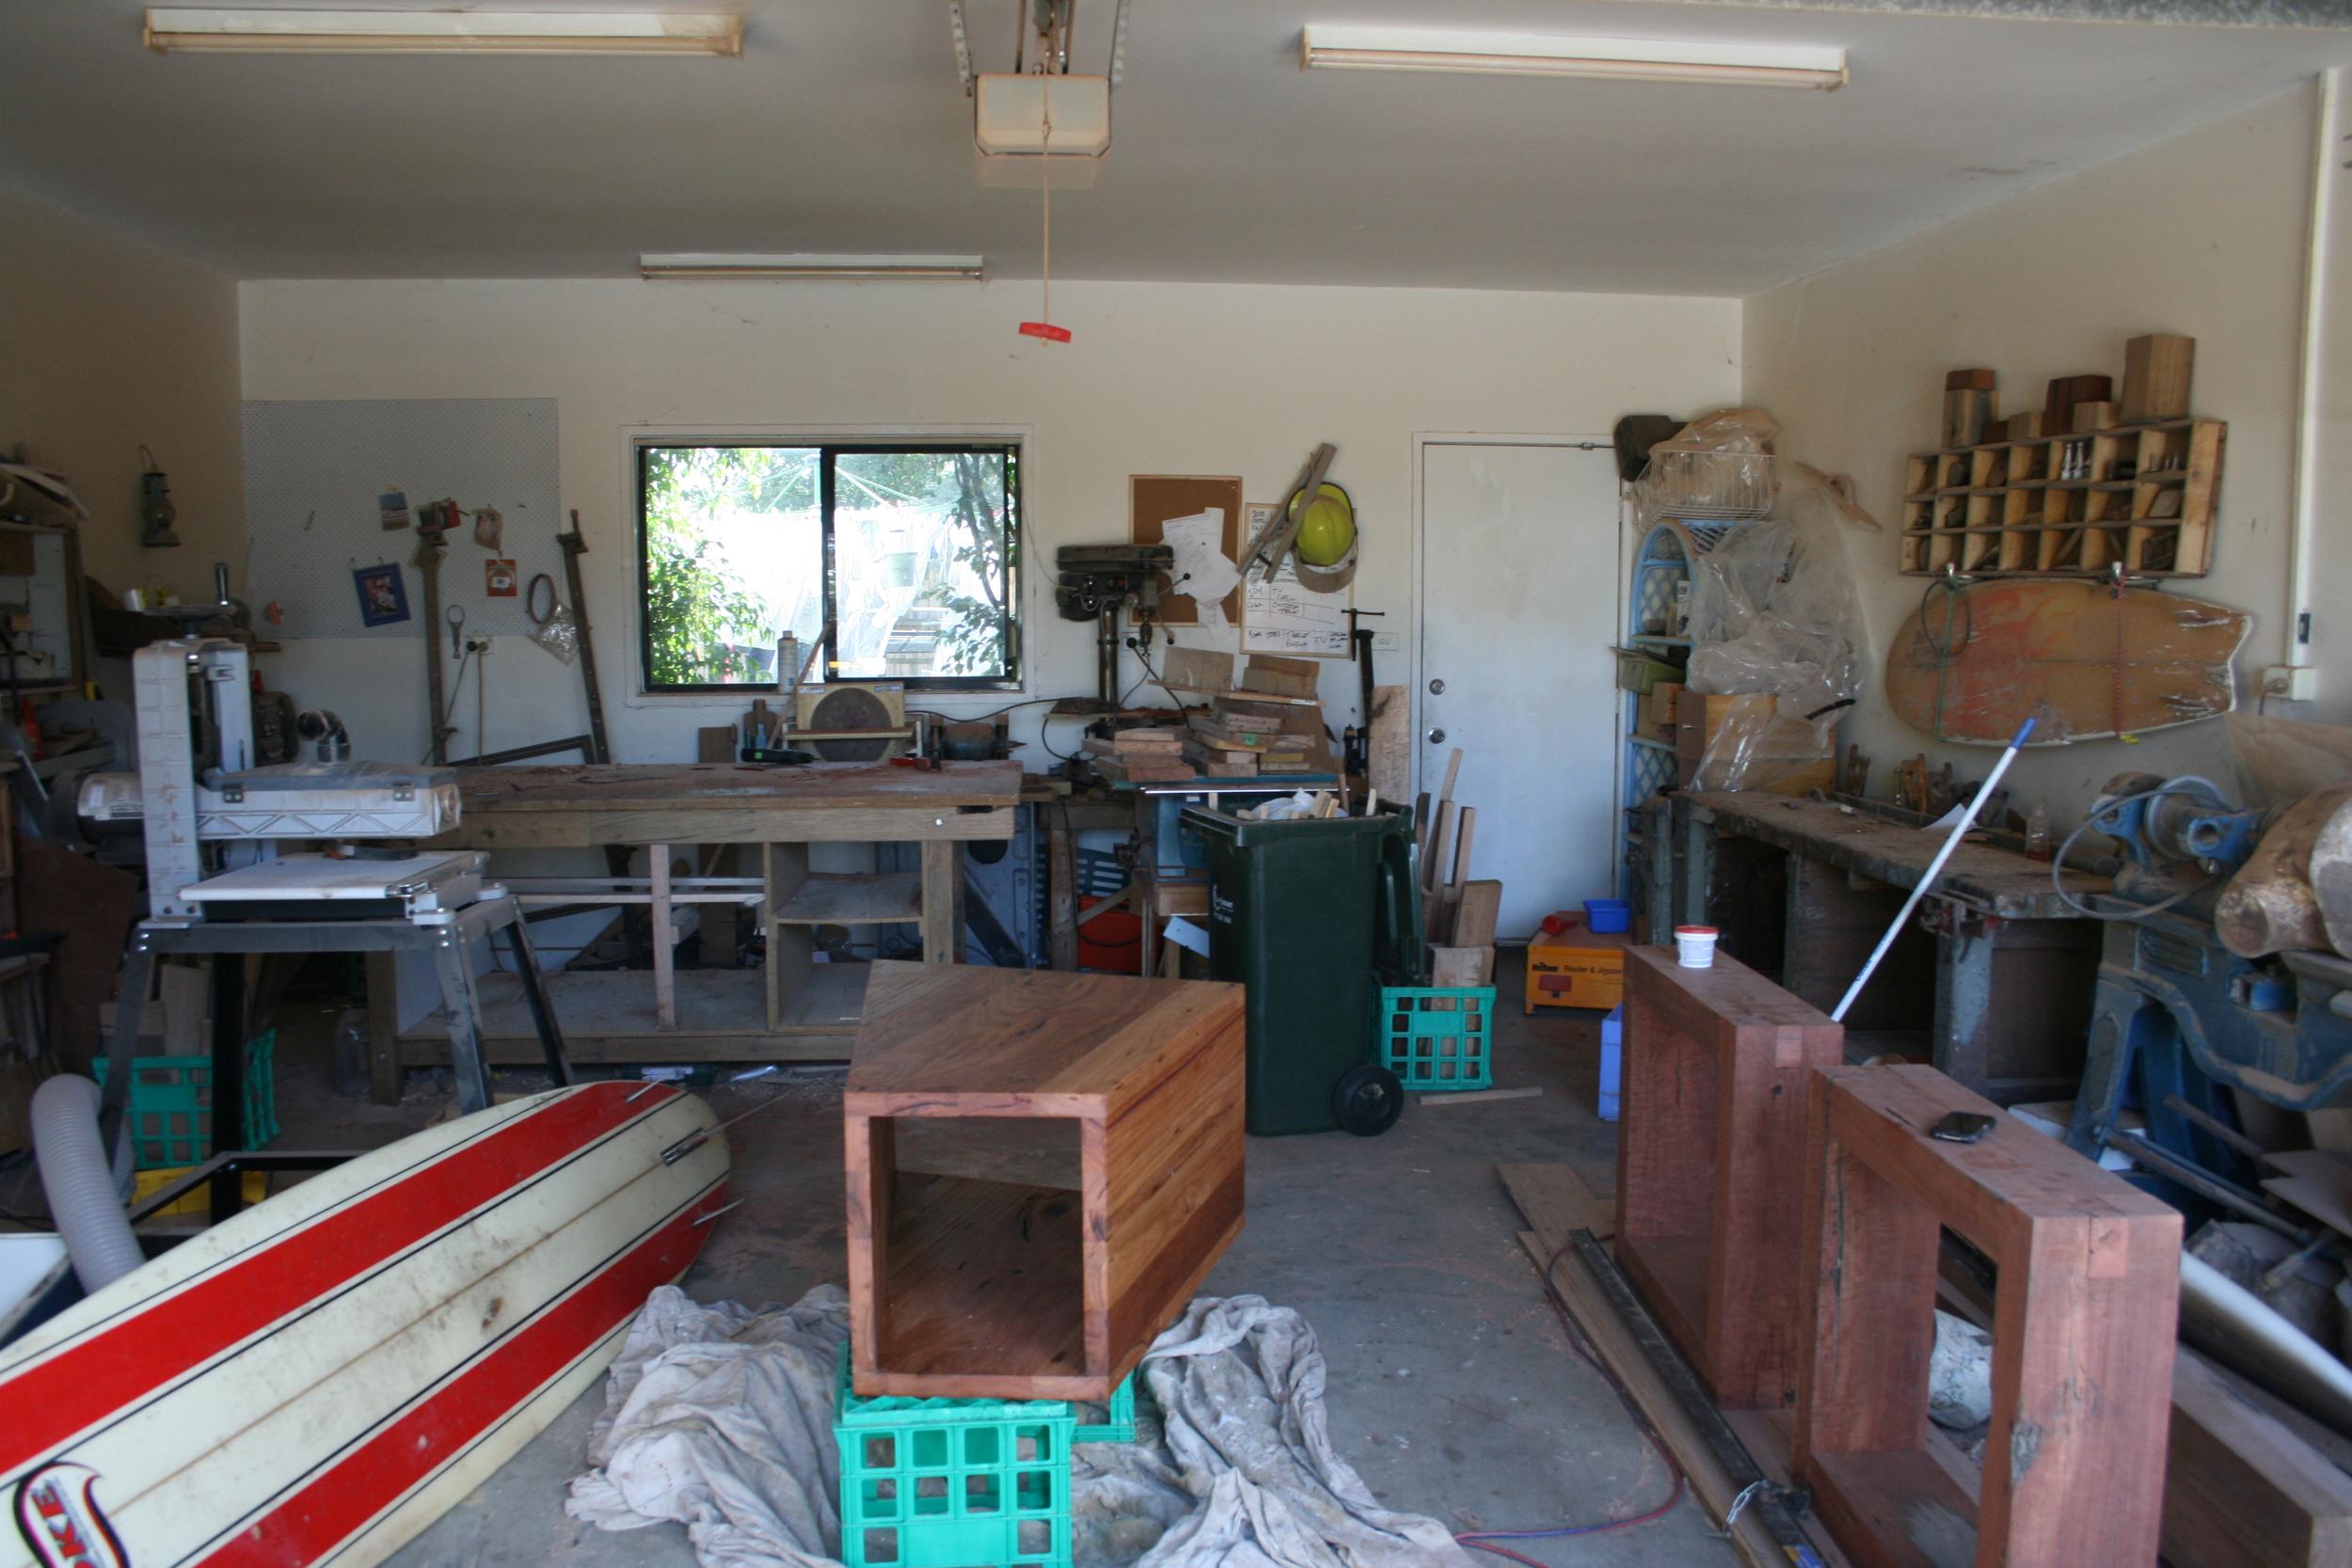 Make shift workshop in our Garage in Torquay